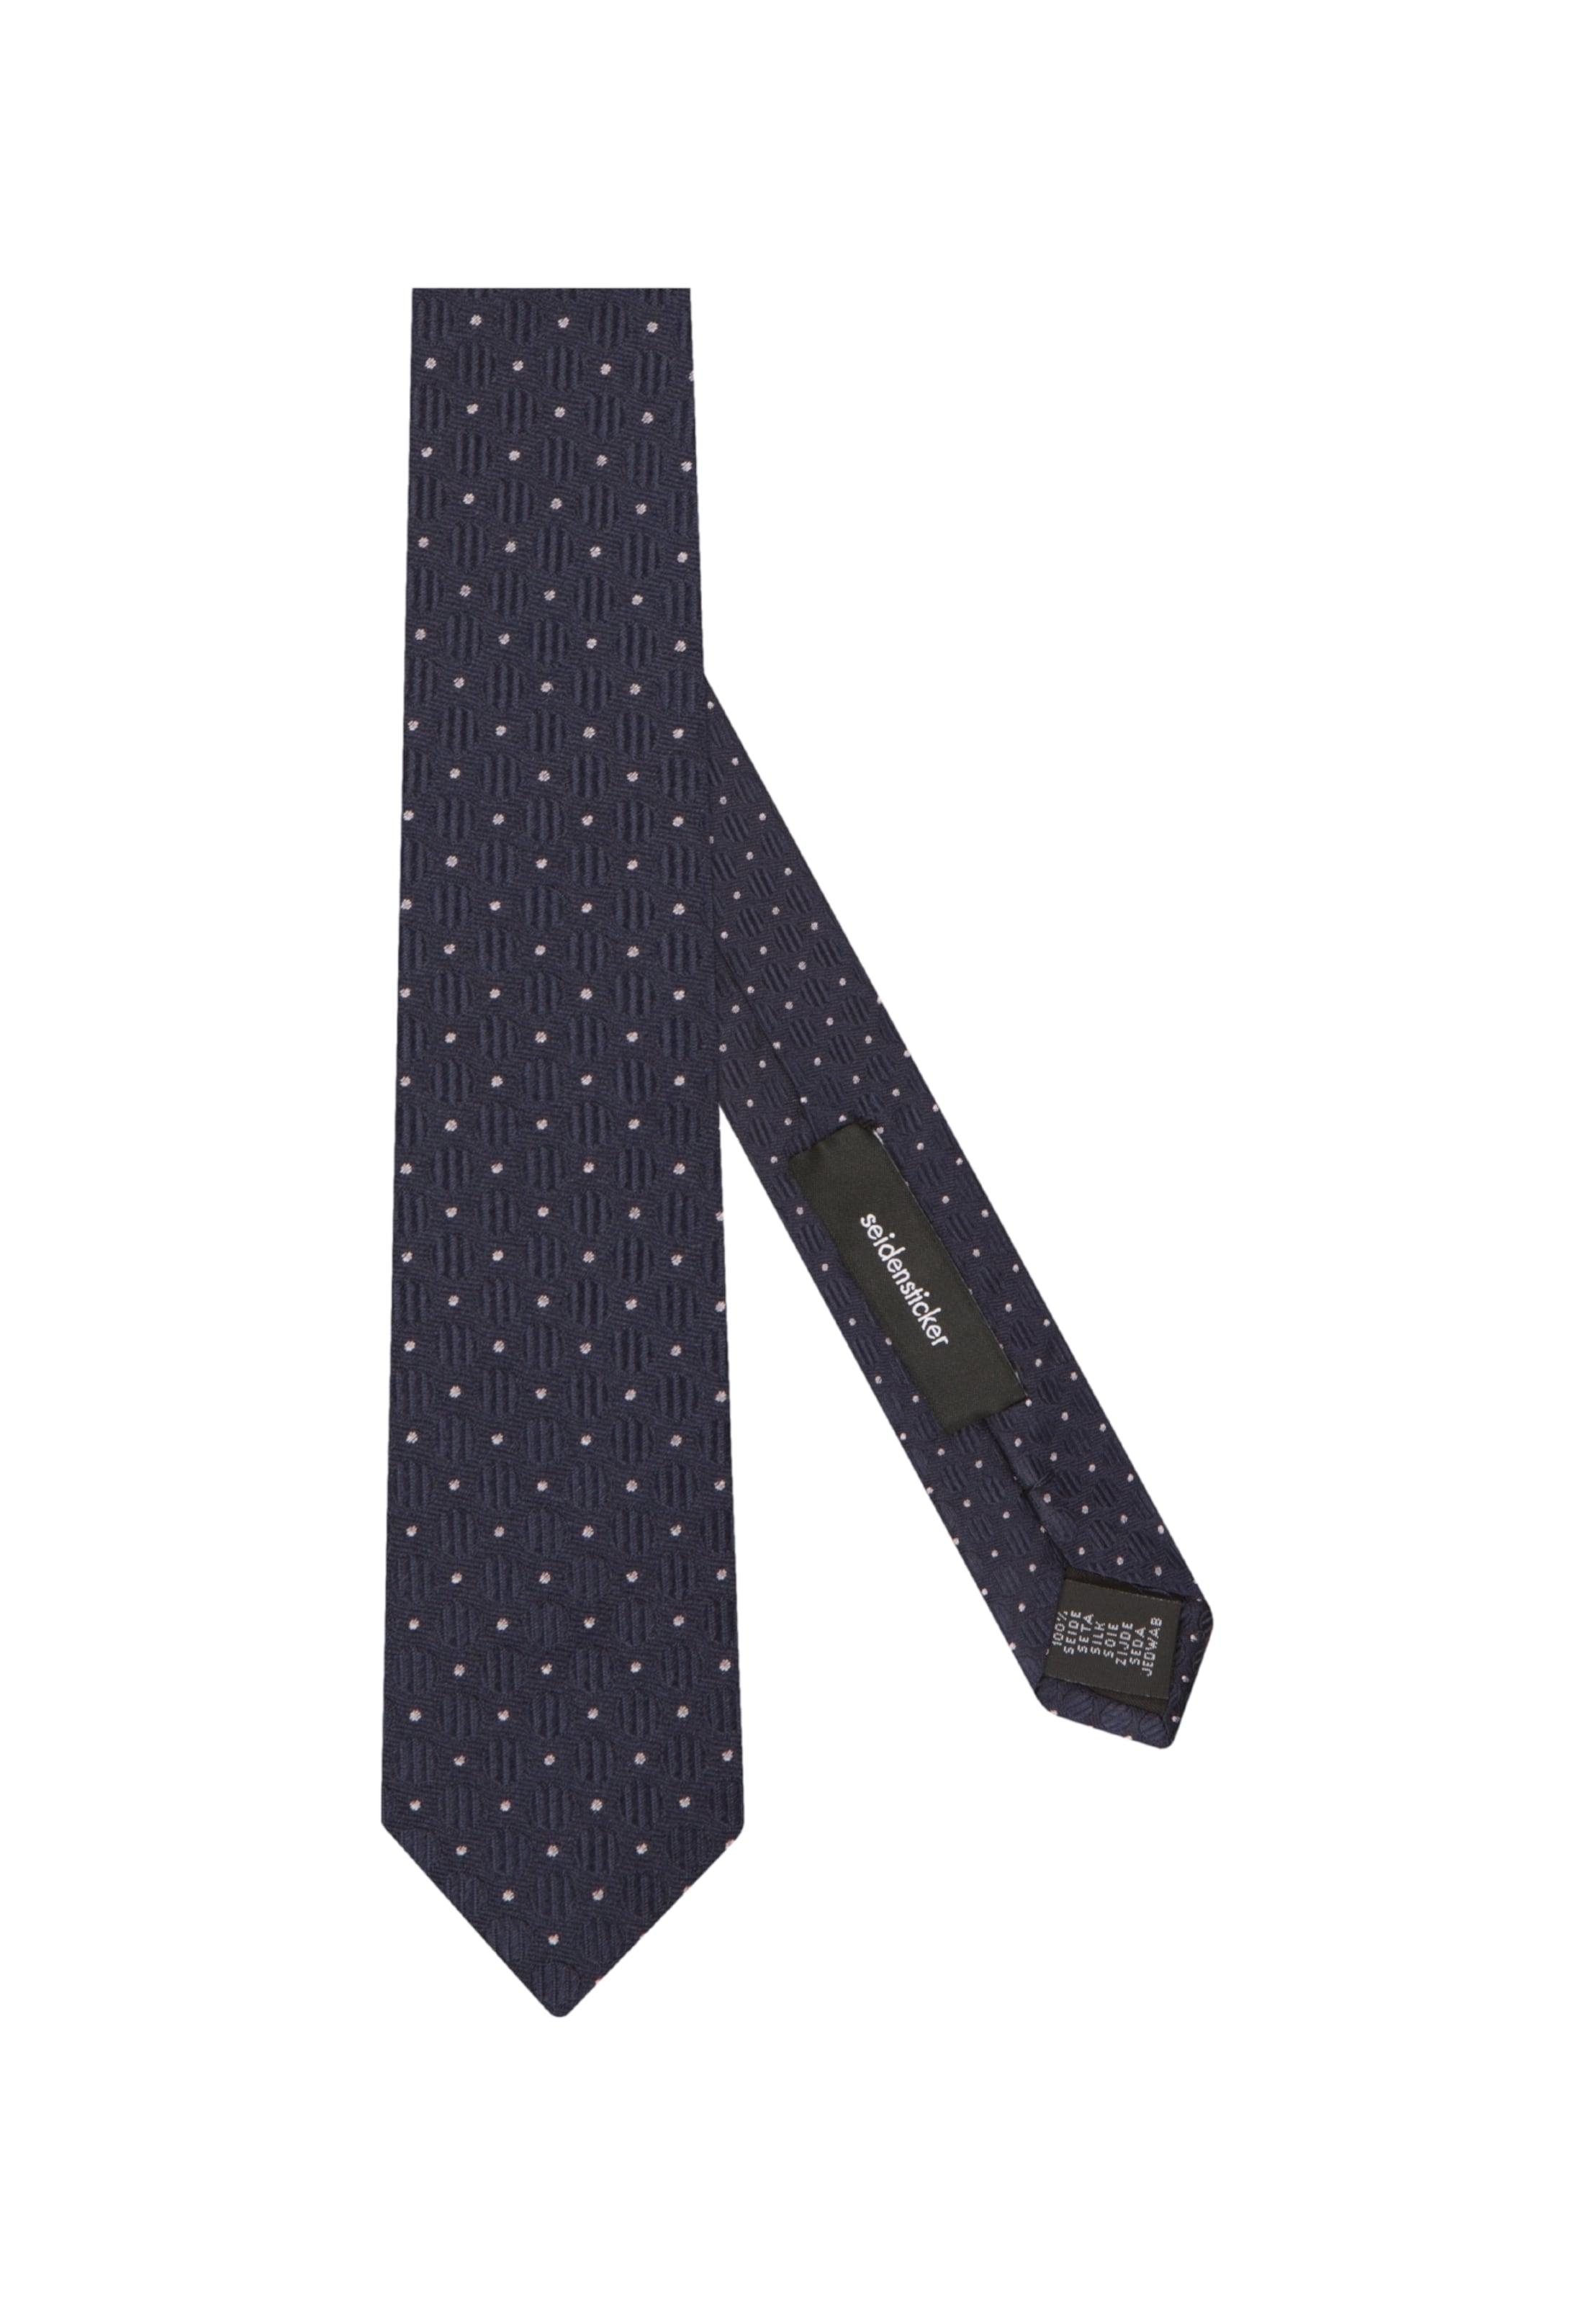 Krawatte KobaltblauWeiß Krawatte 'slim' Seidensticker In Krawatte In 'slim' Seidensticker Seidensticker 'slim' In KobaltblauWeiß YEWDHIe92